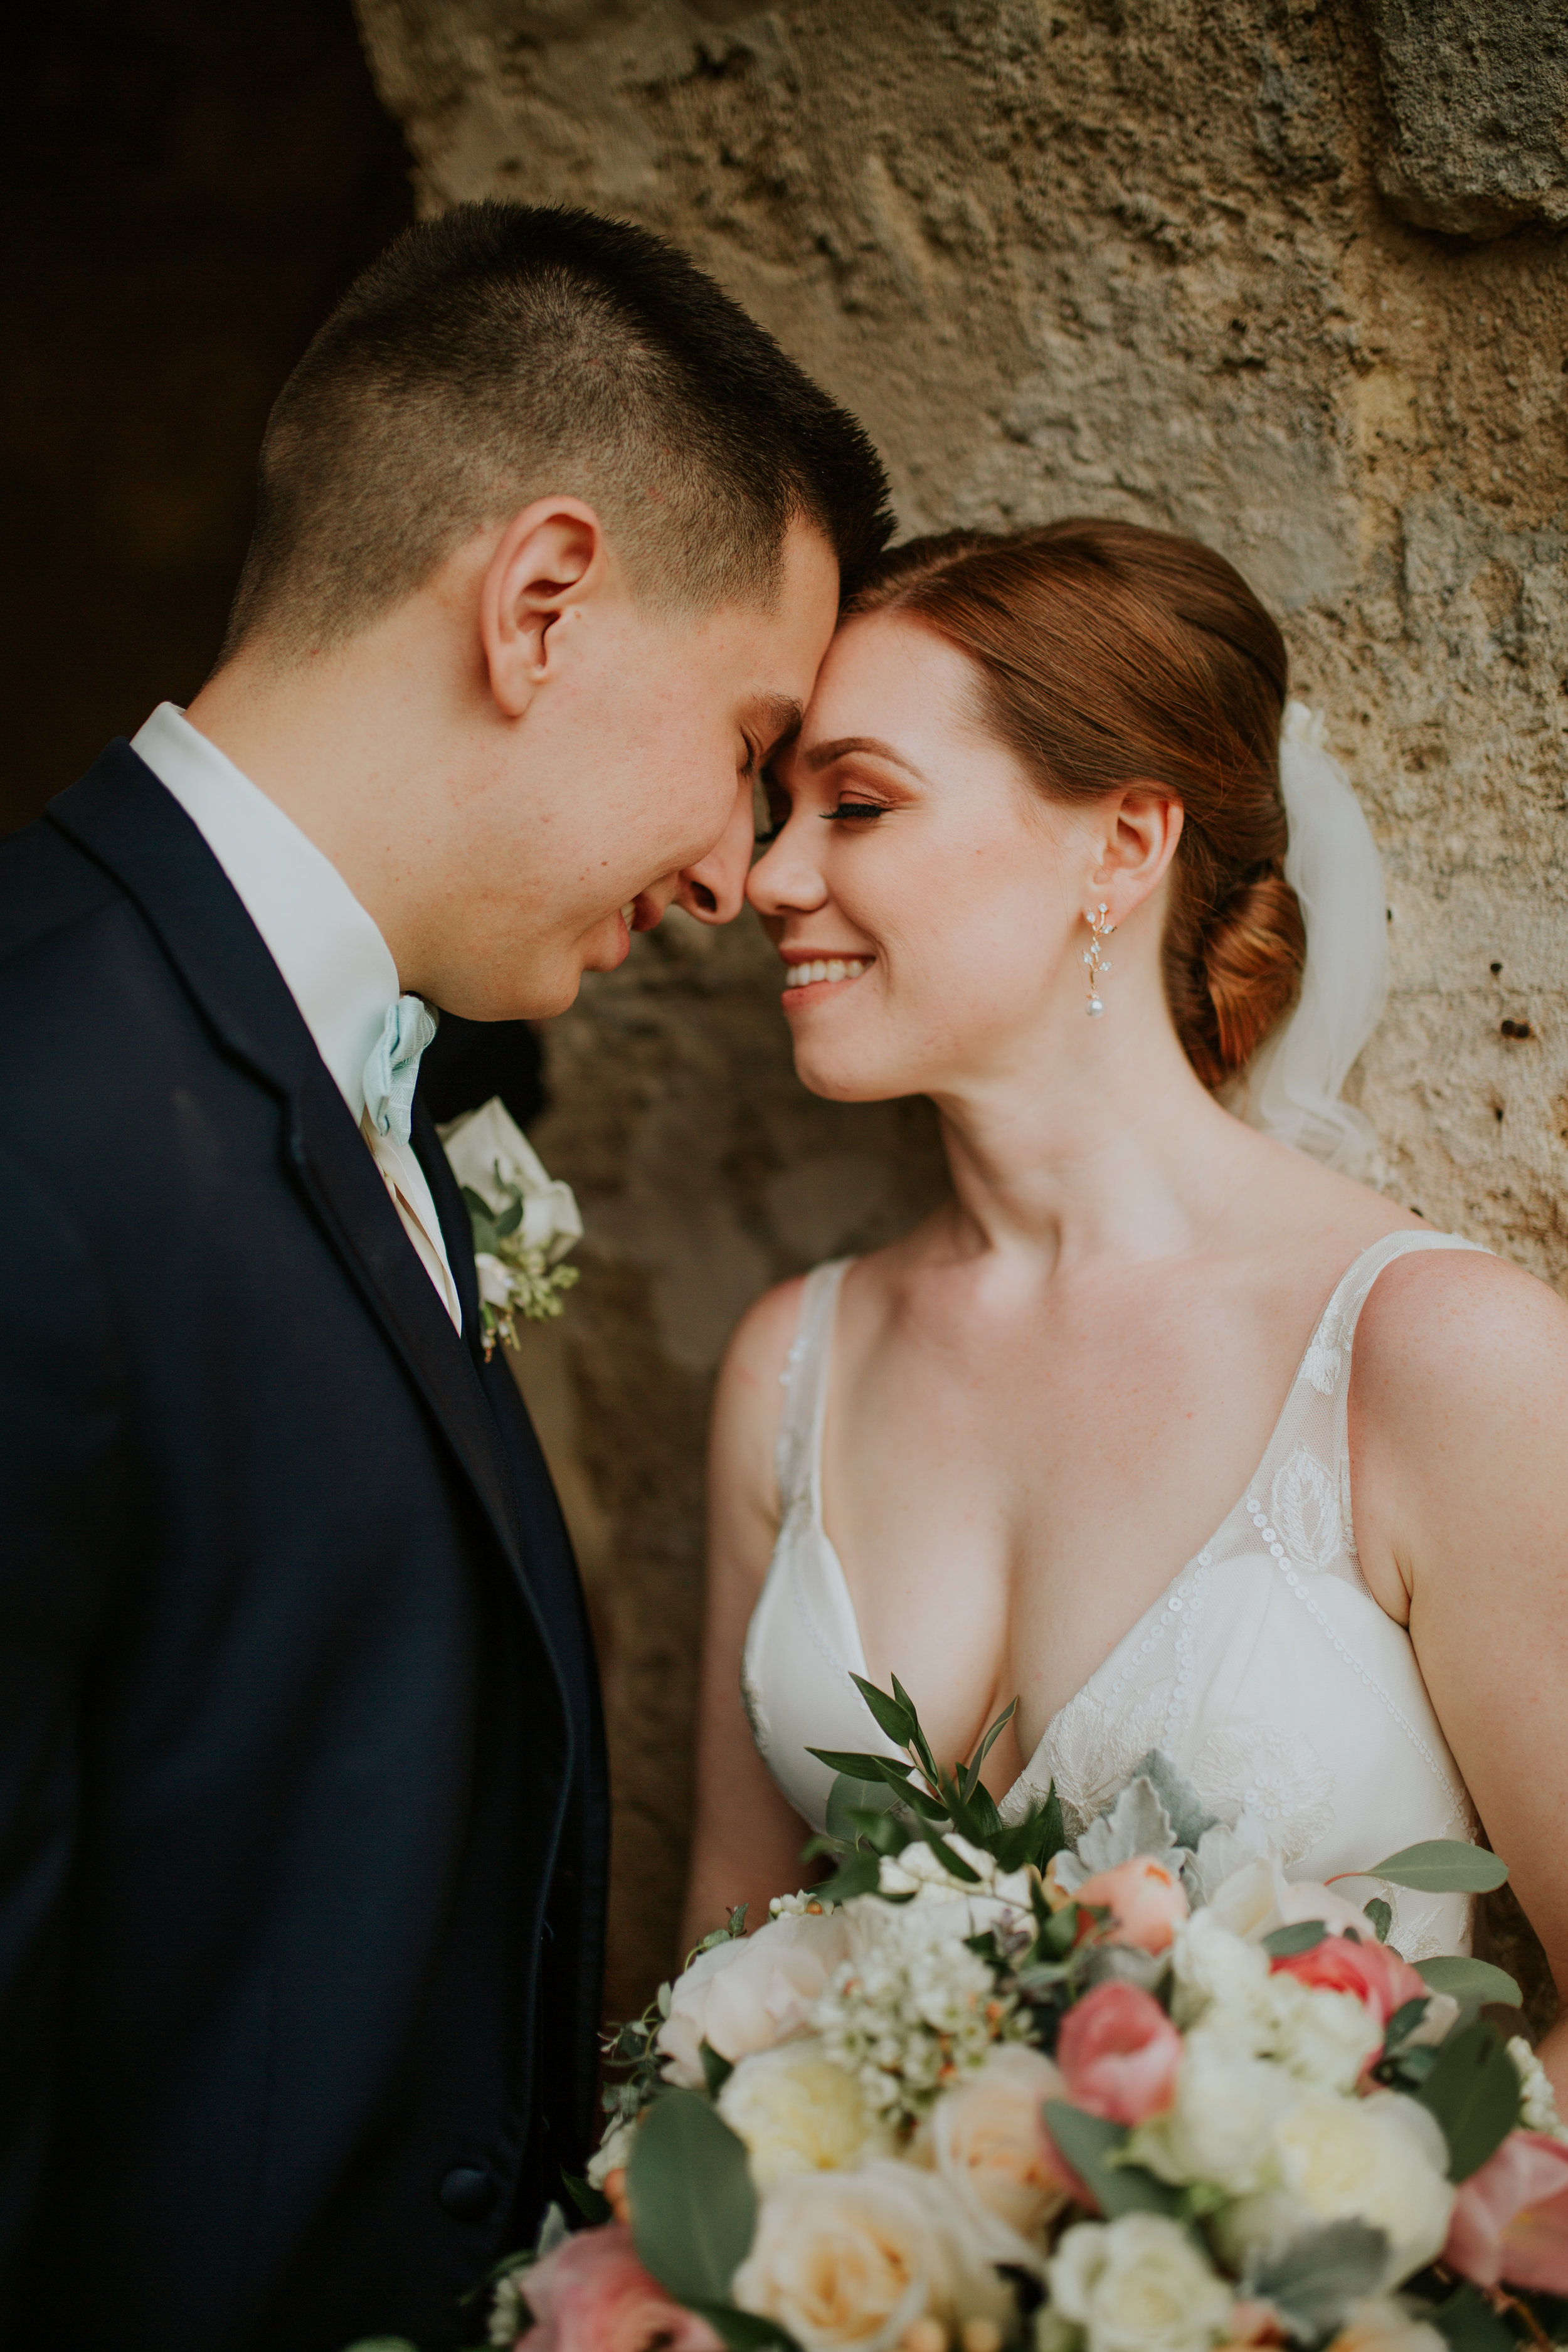 Jenna + Brandon  ↠  Mission concepcion  & Sunset Station Wedding